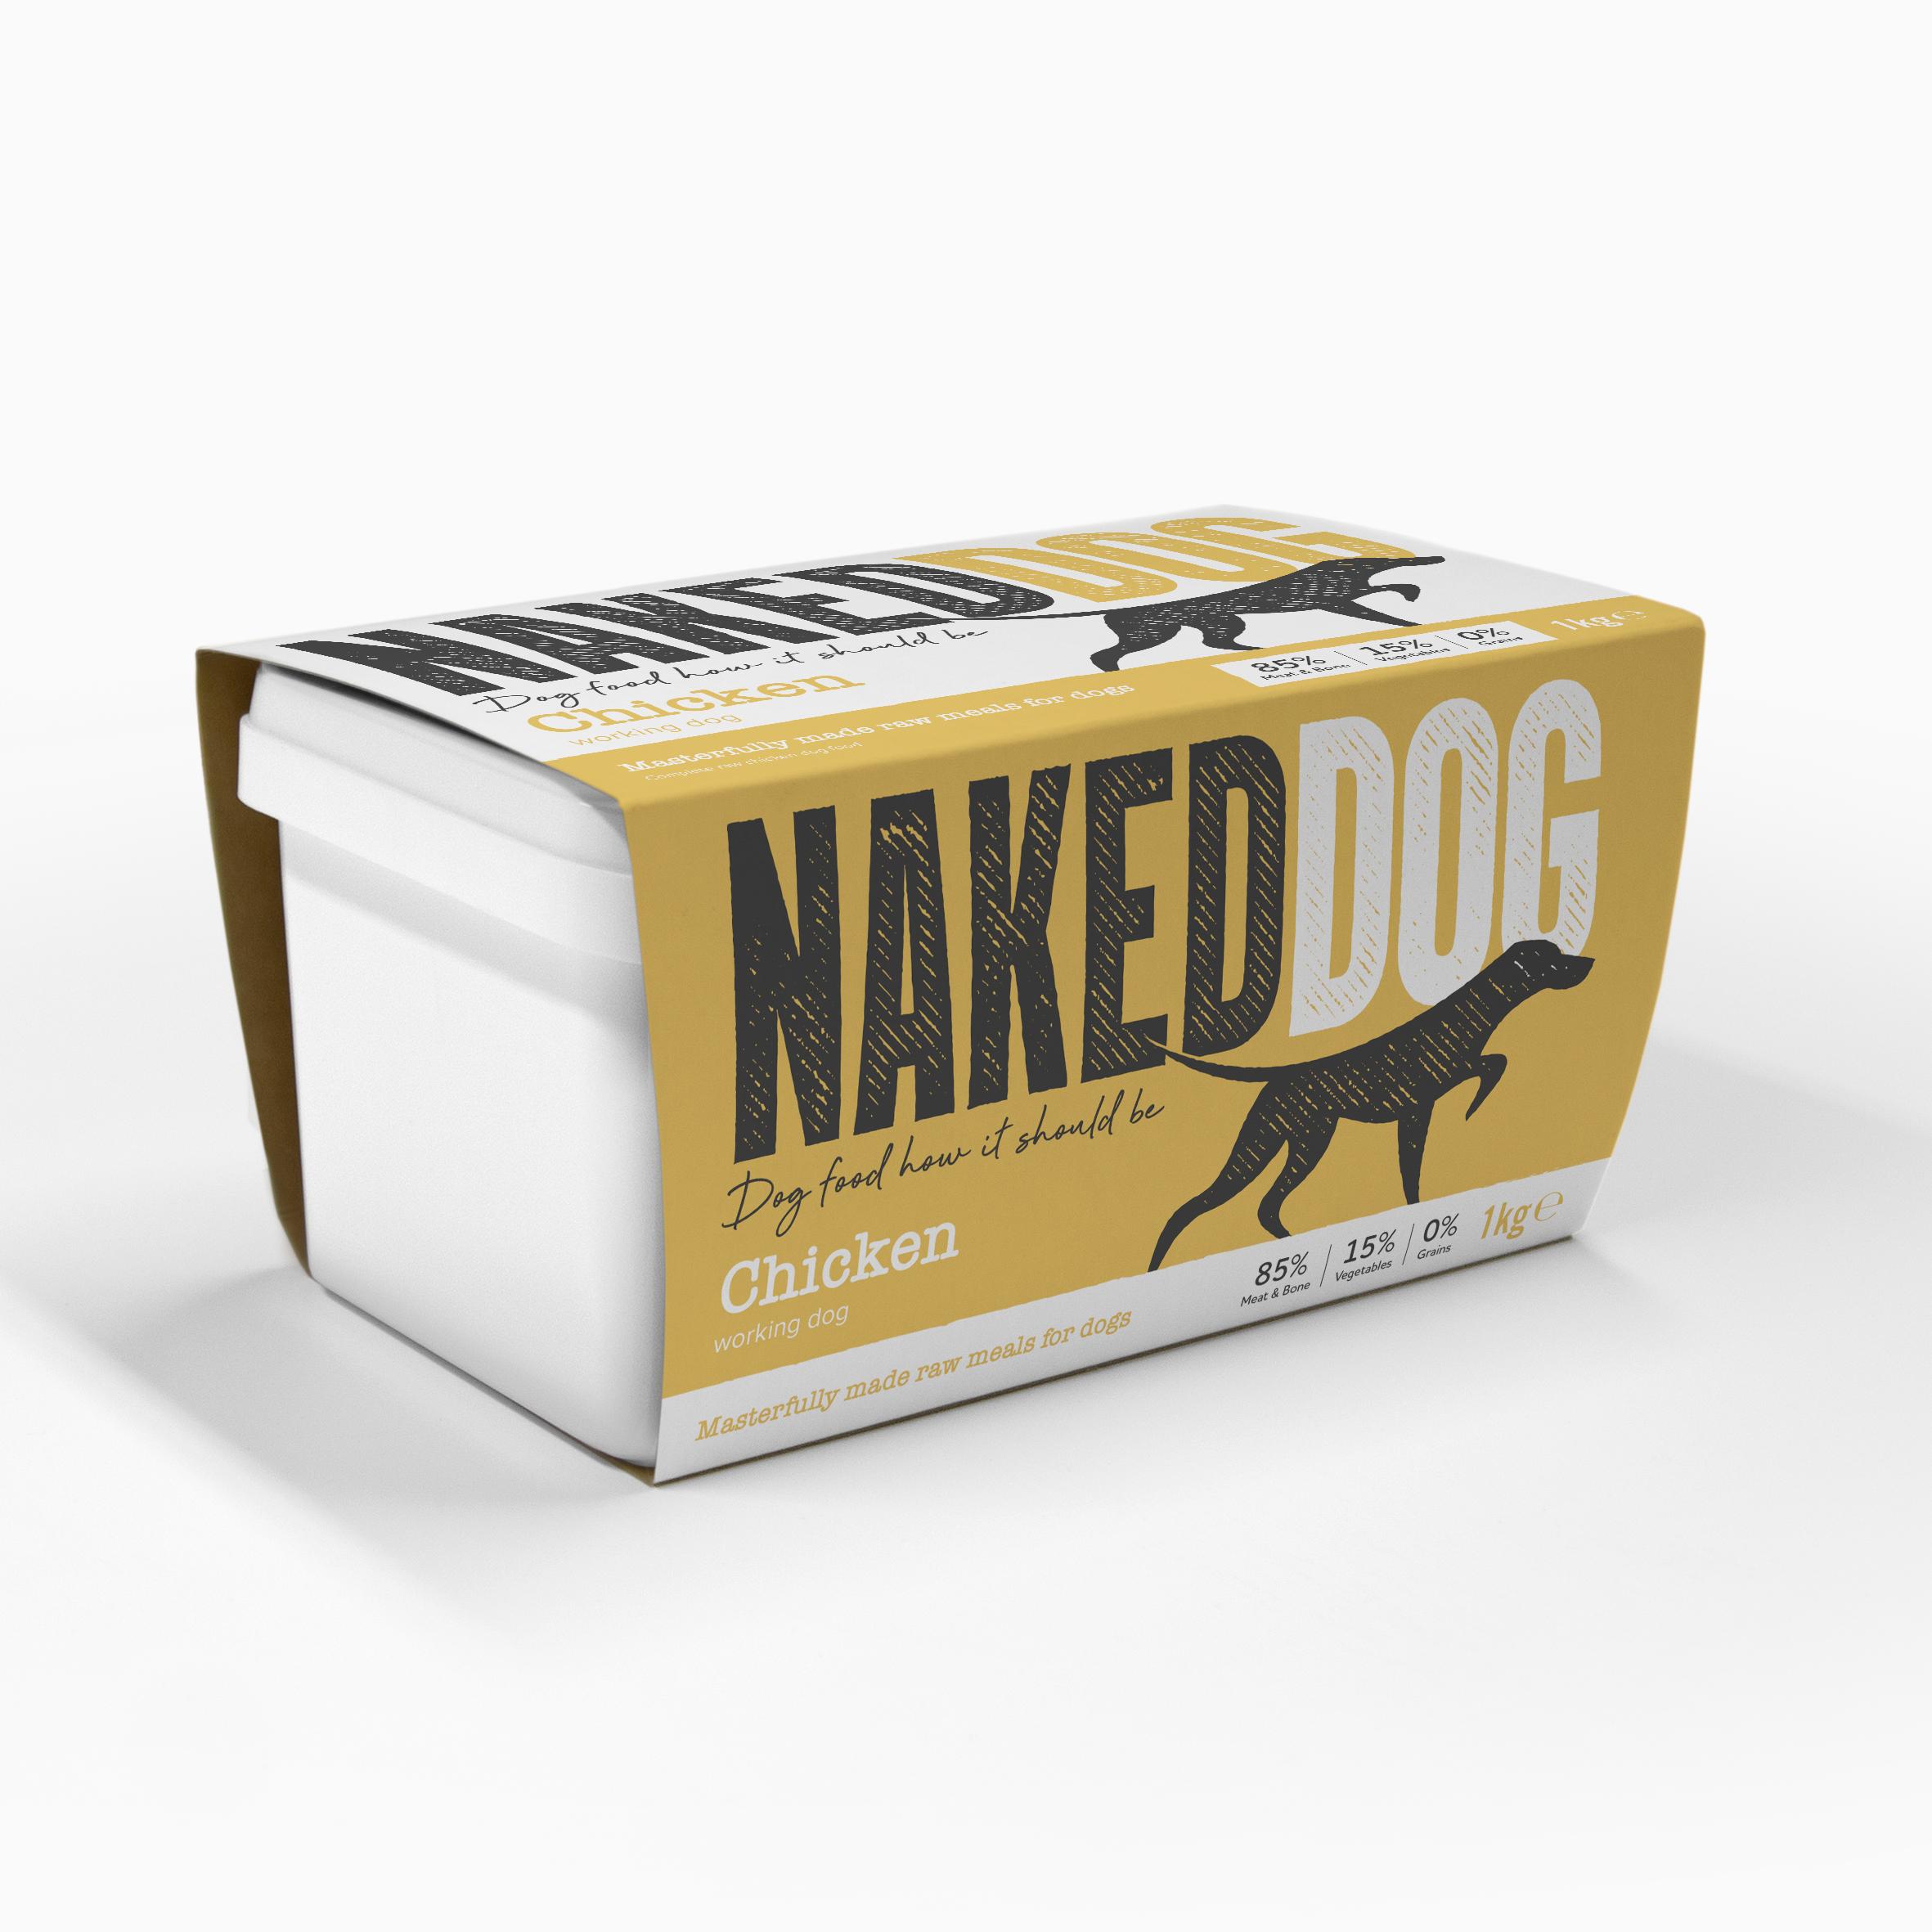 Naked Dog_product image-1kg pack_Chicken